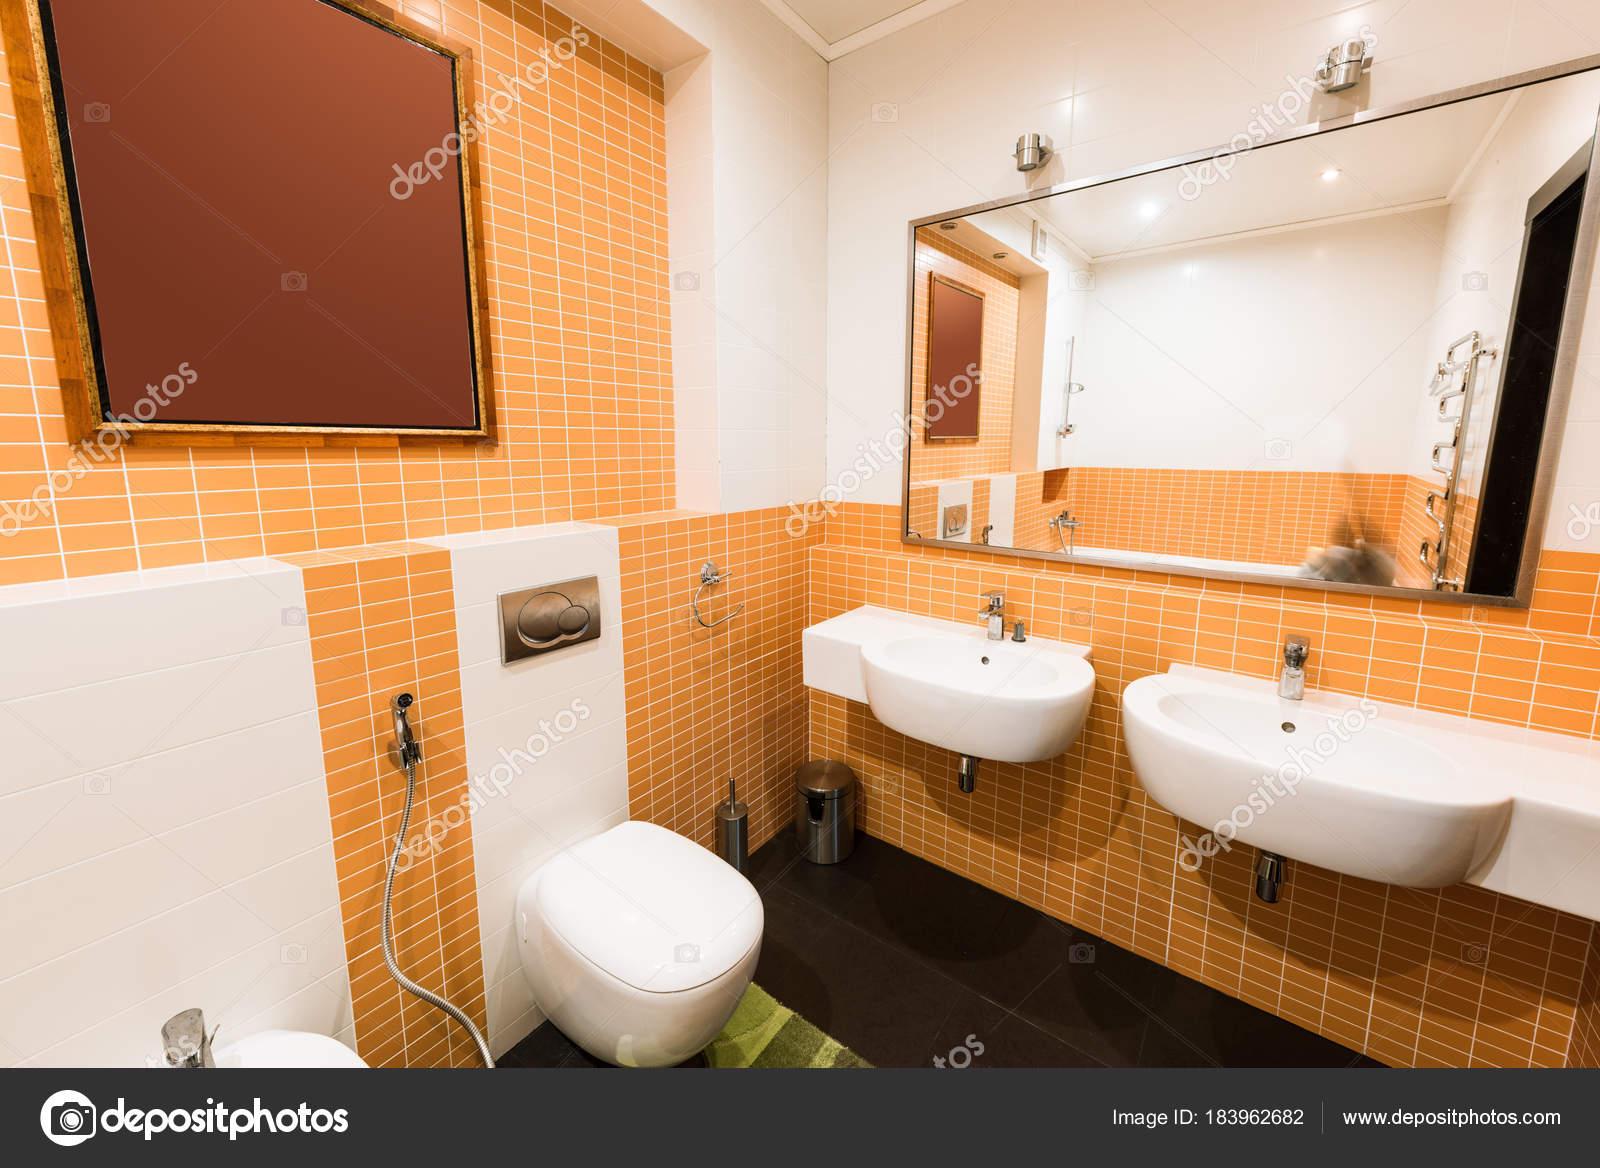 Close Van Moderne Badkamer Oranje Witte Kleuren — Stockfoto © Y ...